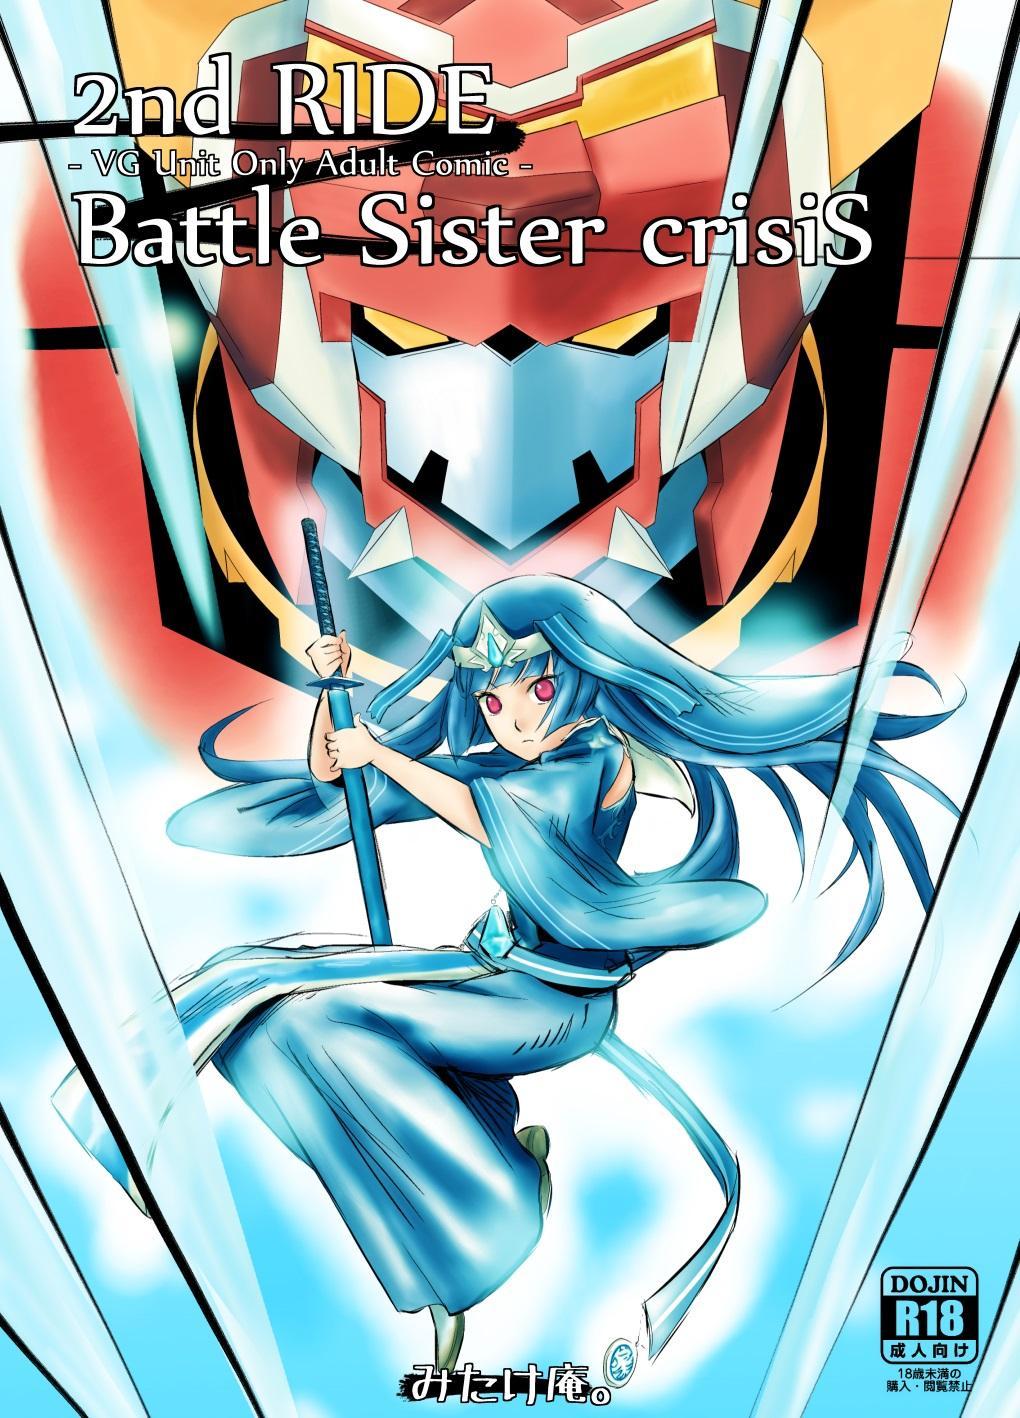 2nd RIDE Battle Sister crisiS 0